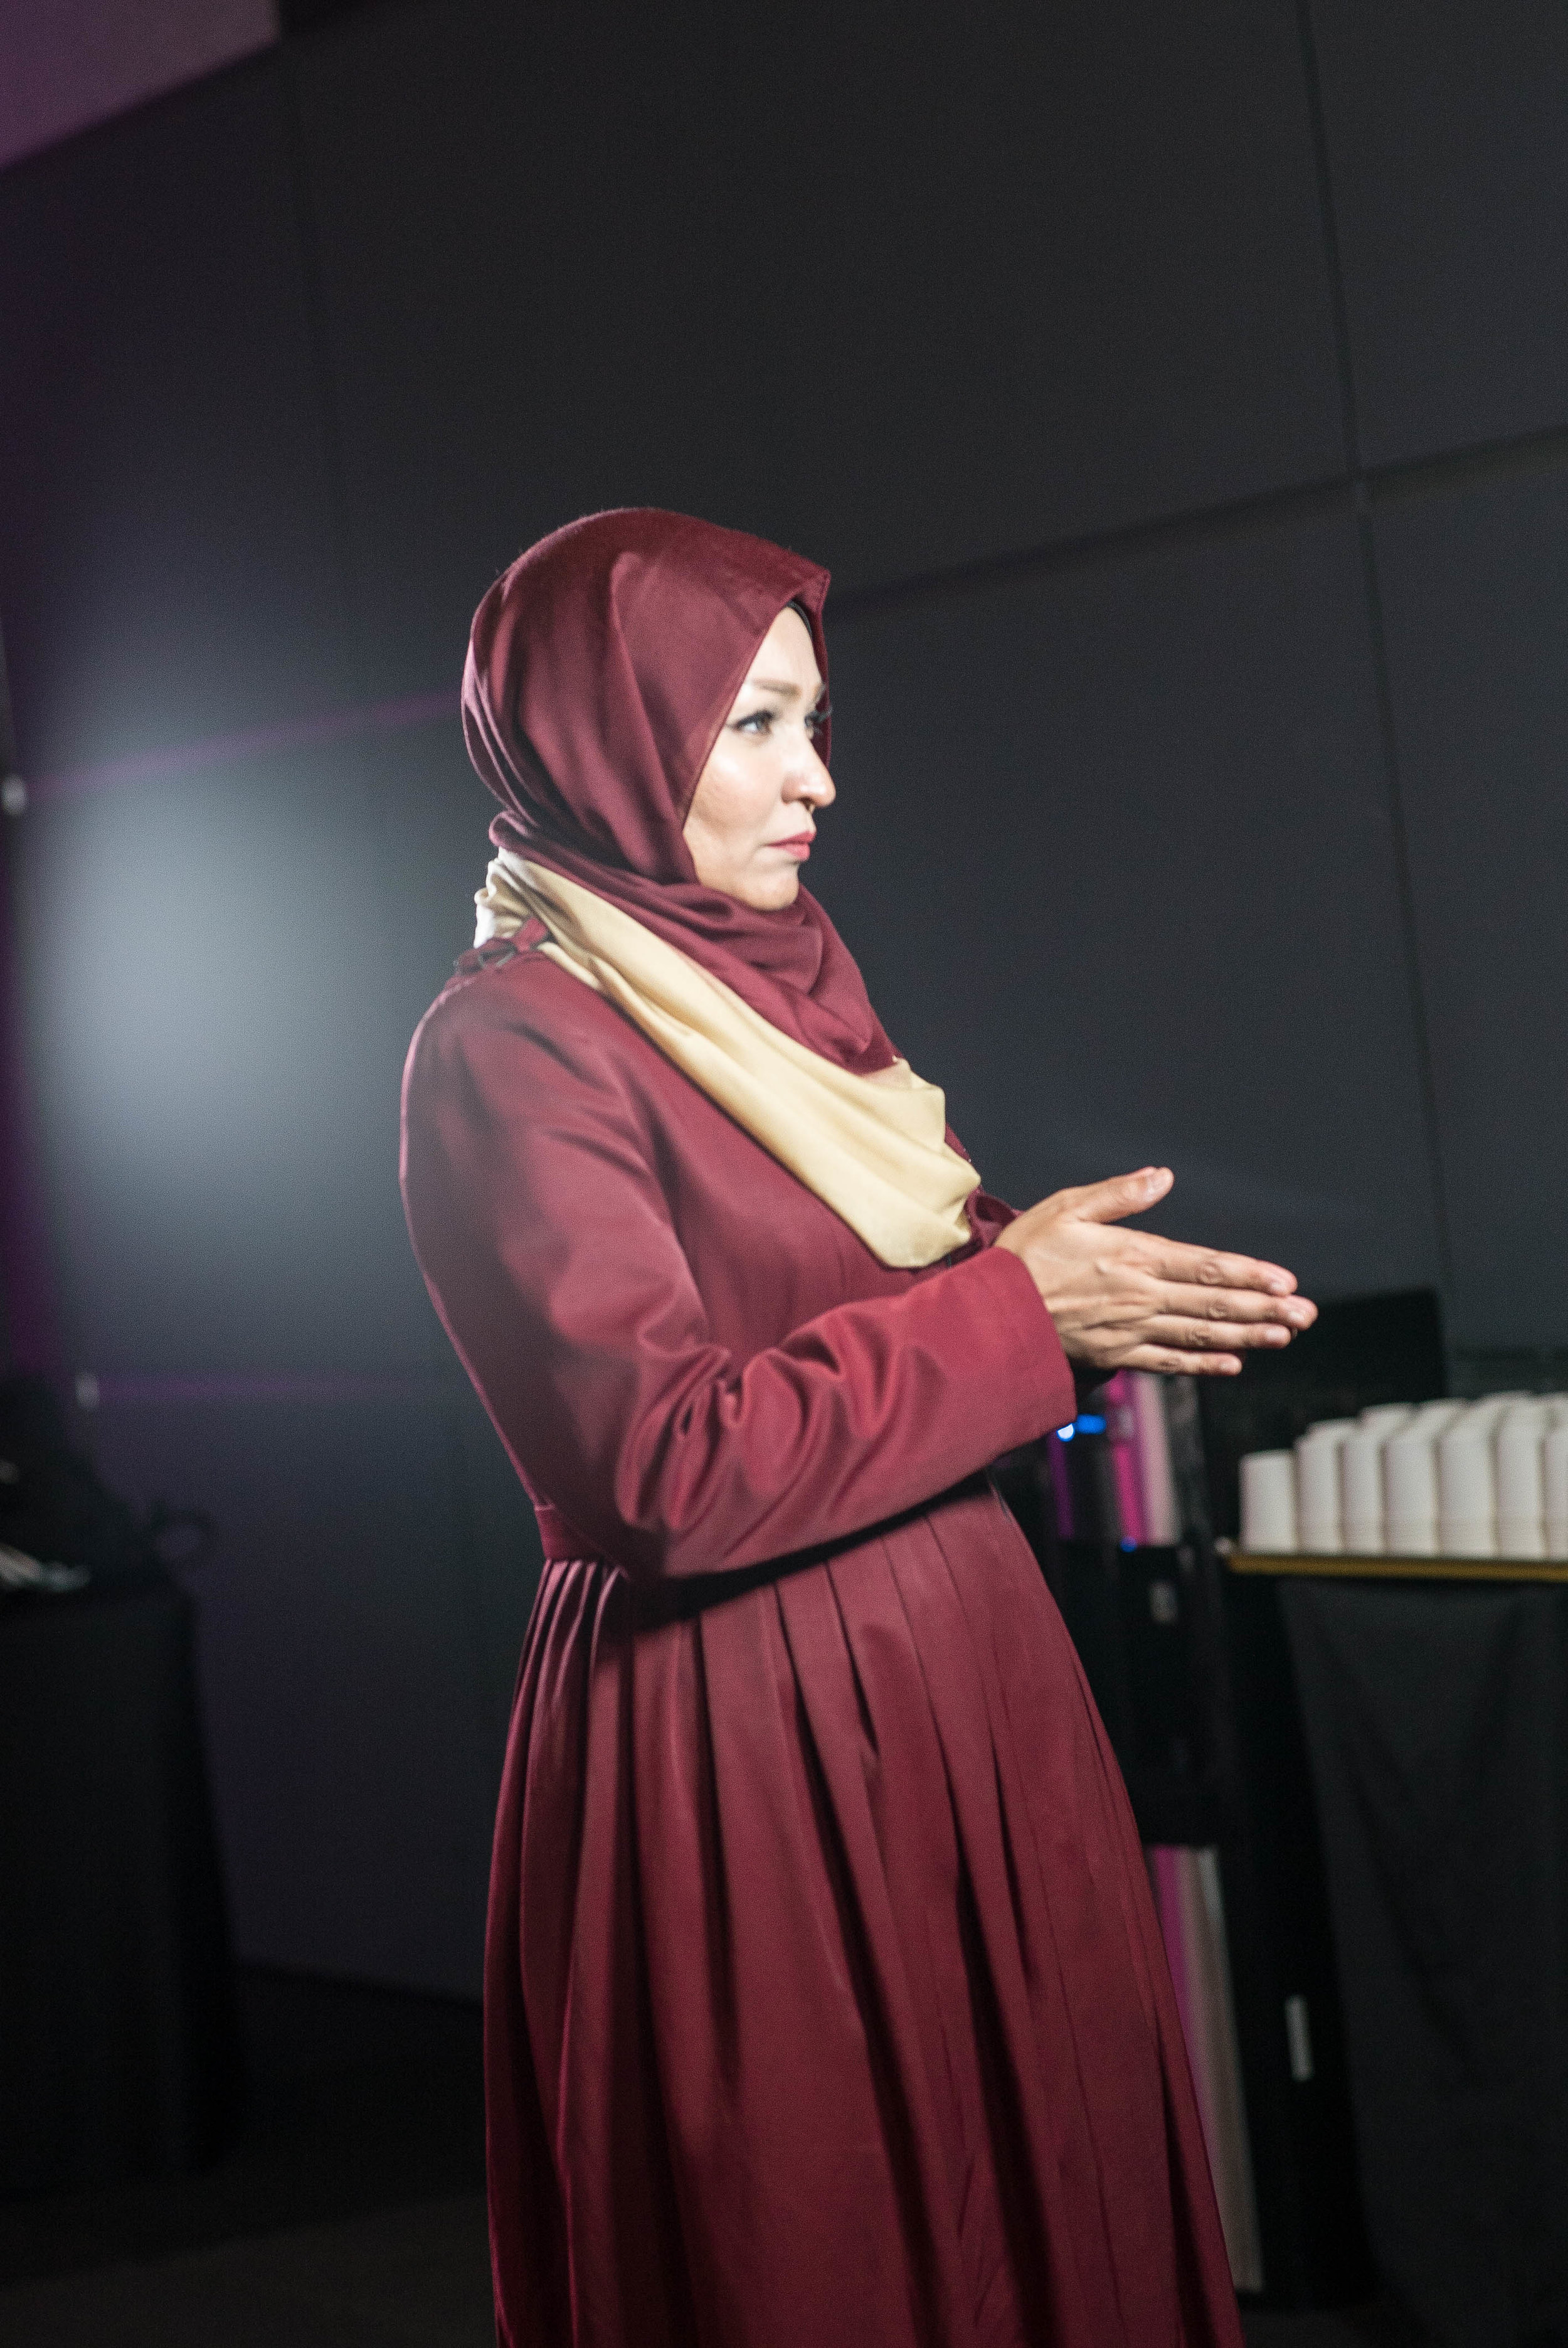 Suria Sparks mid-interview